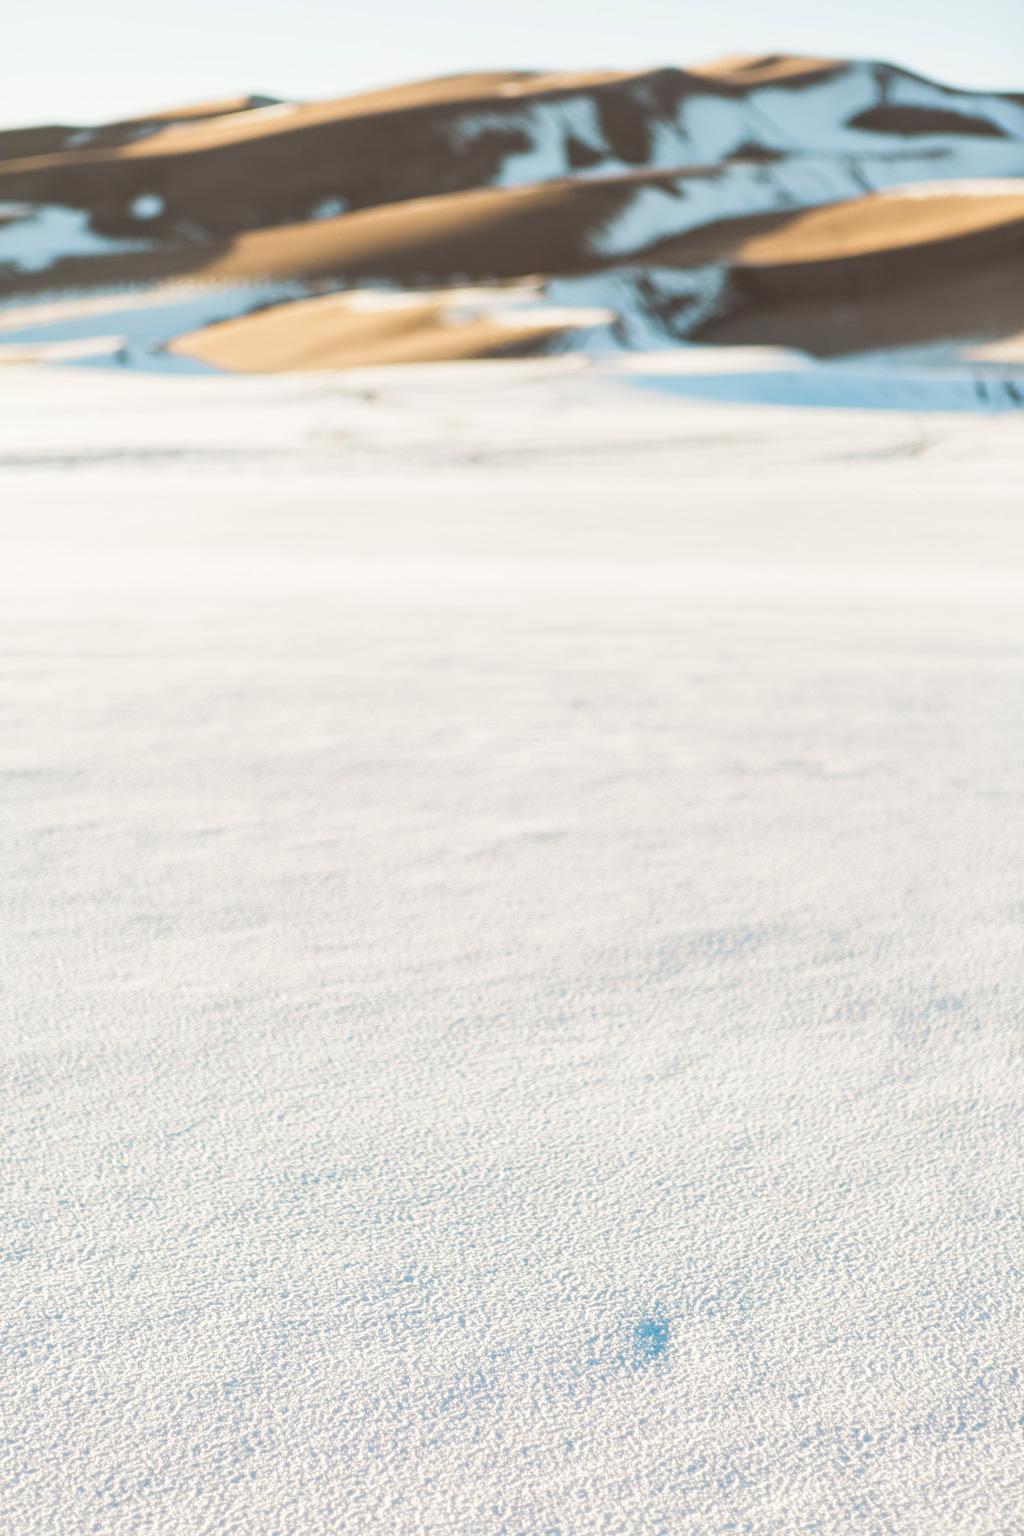 CindyGiovagnoli_Great_Sand_Dunes_National_Park_NPS_Colorado_roadtrip-006.jpg